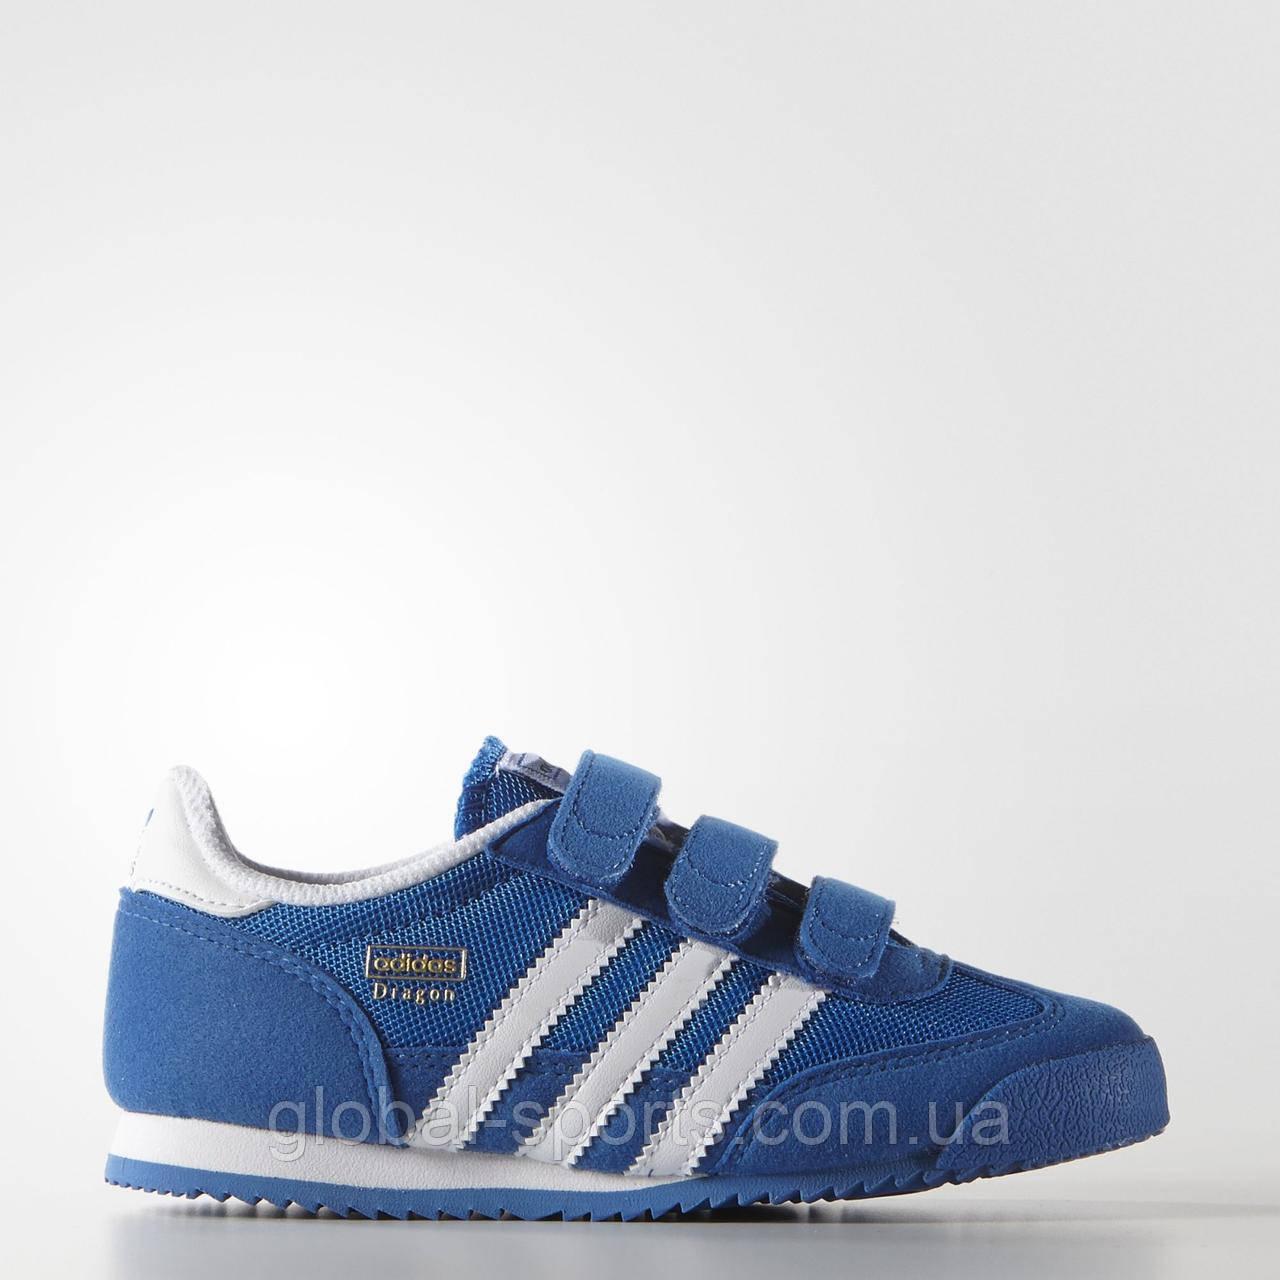 Детские кроссовки Adidas Dragon K (АРТИКУЛ D67699)  продажа e8f17809c577d